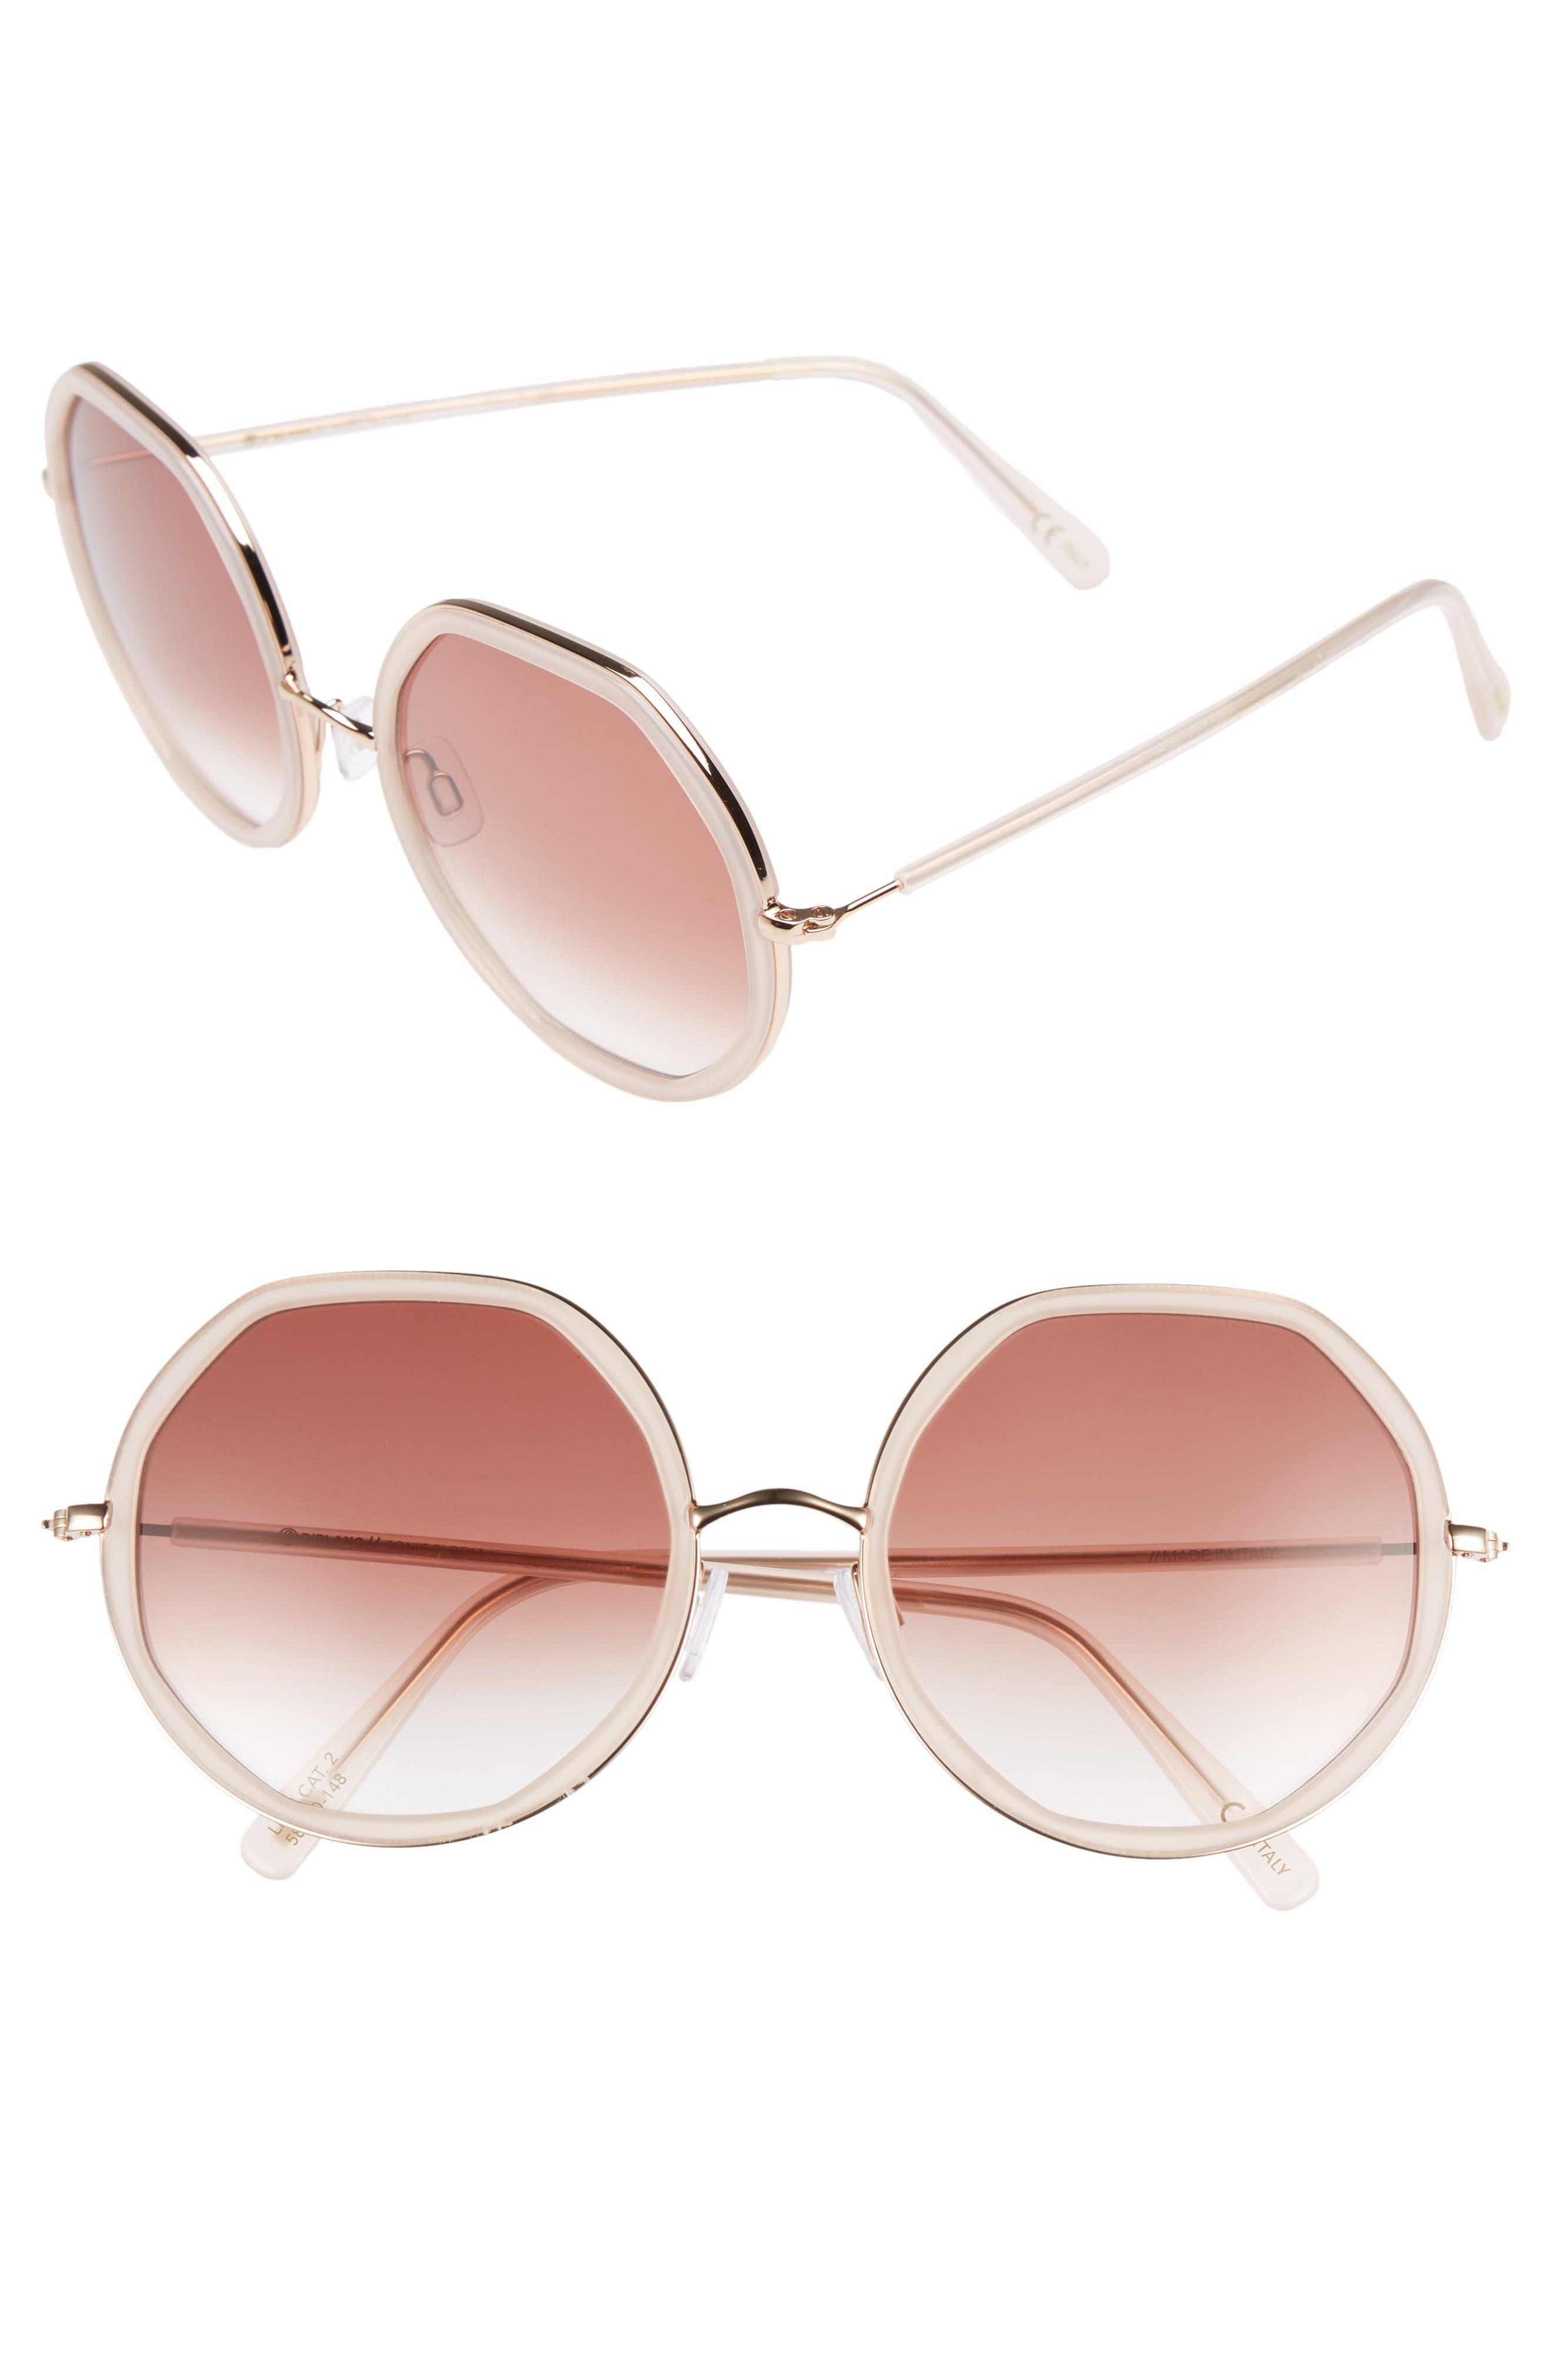 D'BLANC Sonic Bloom 58mm Sunglasses,                             Main thumbnail 1, color,                             OCTAGON BLUSH